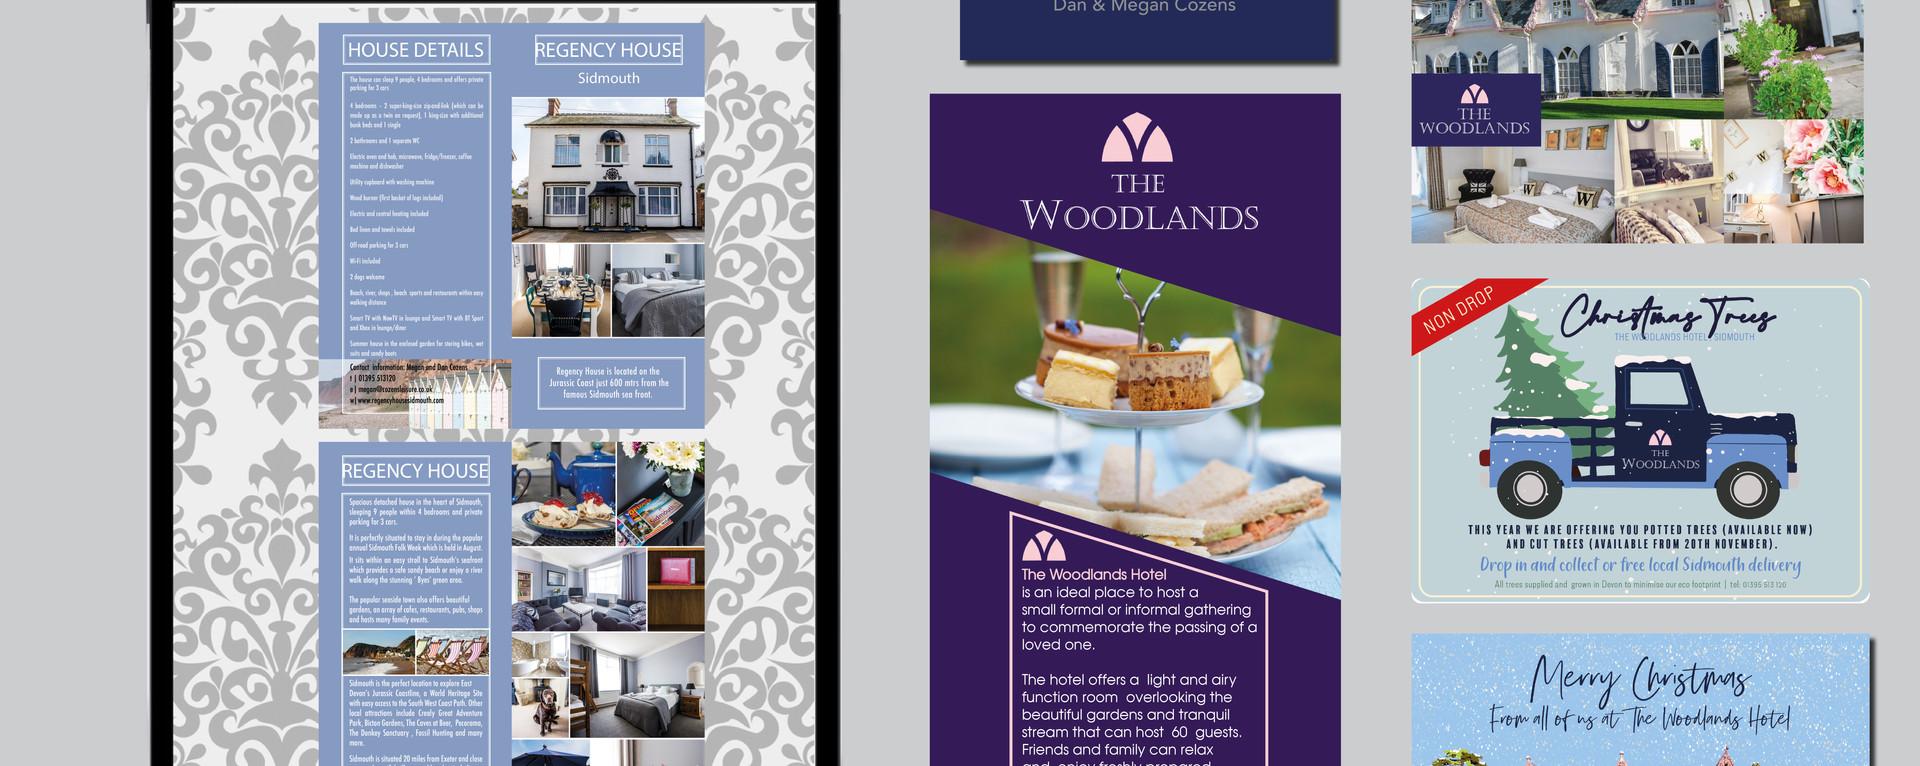 WOODLANDS HOTEL